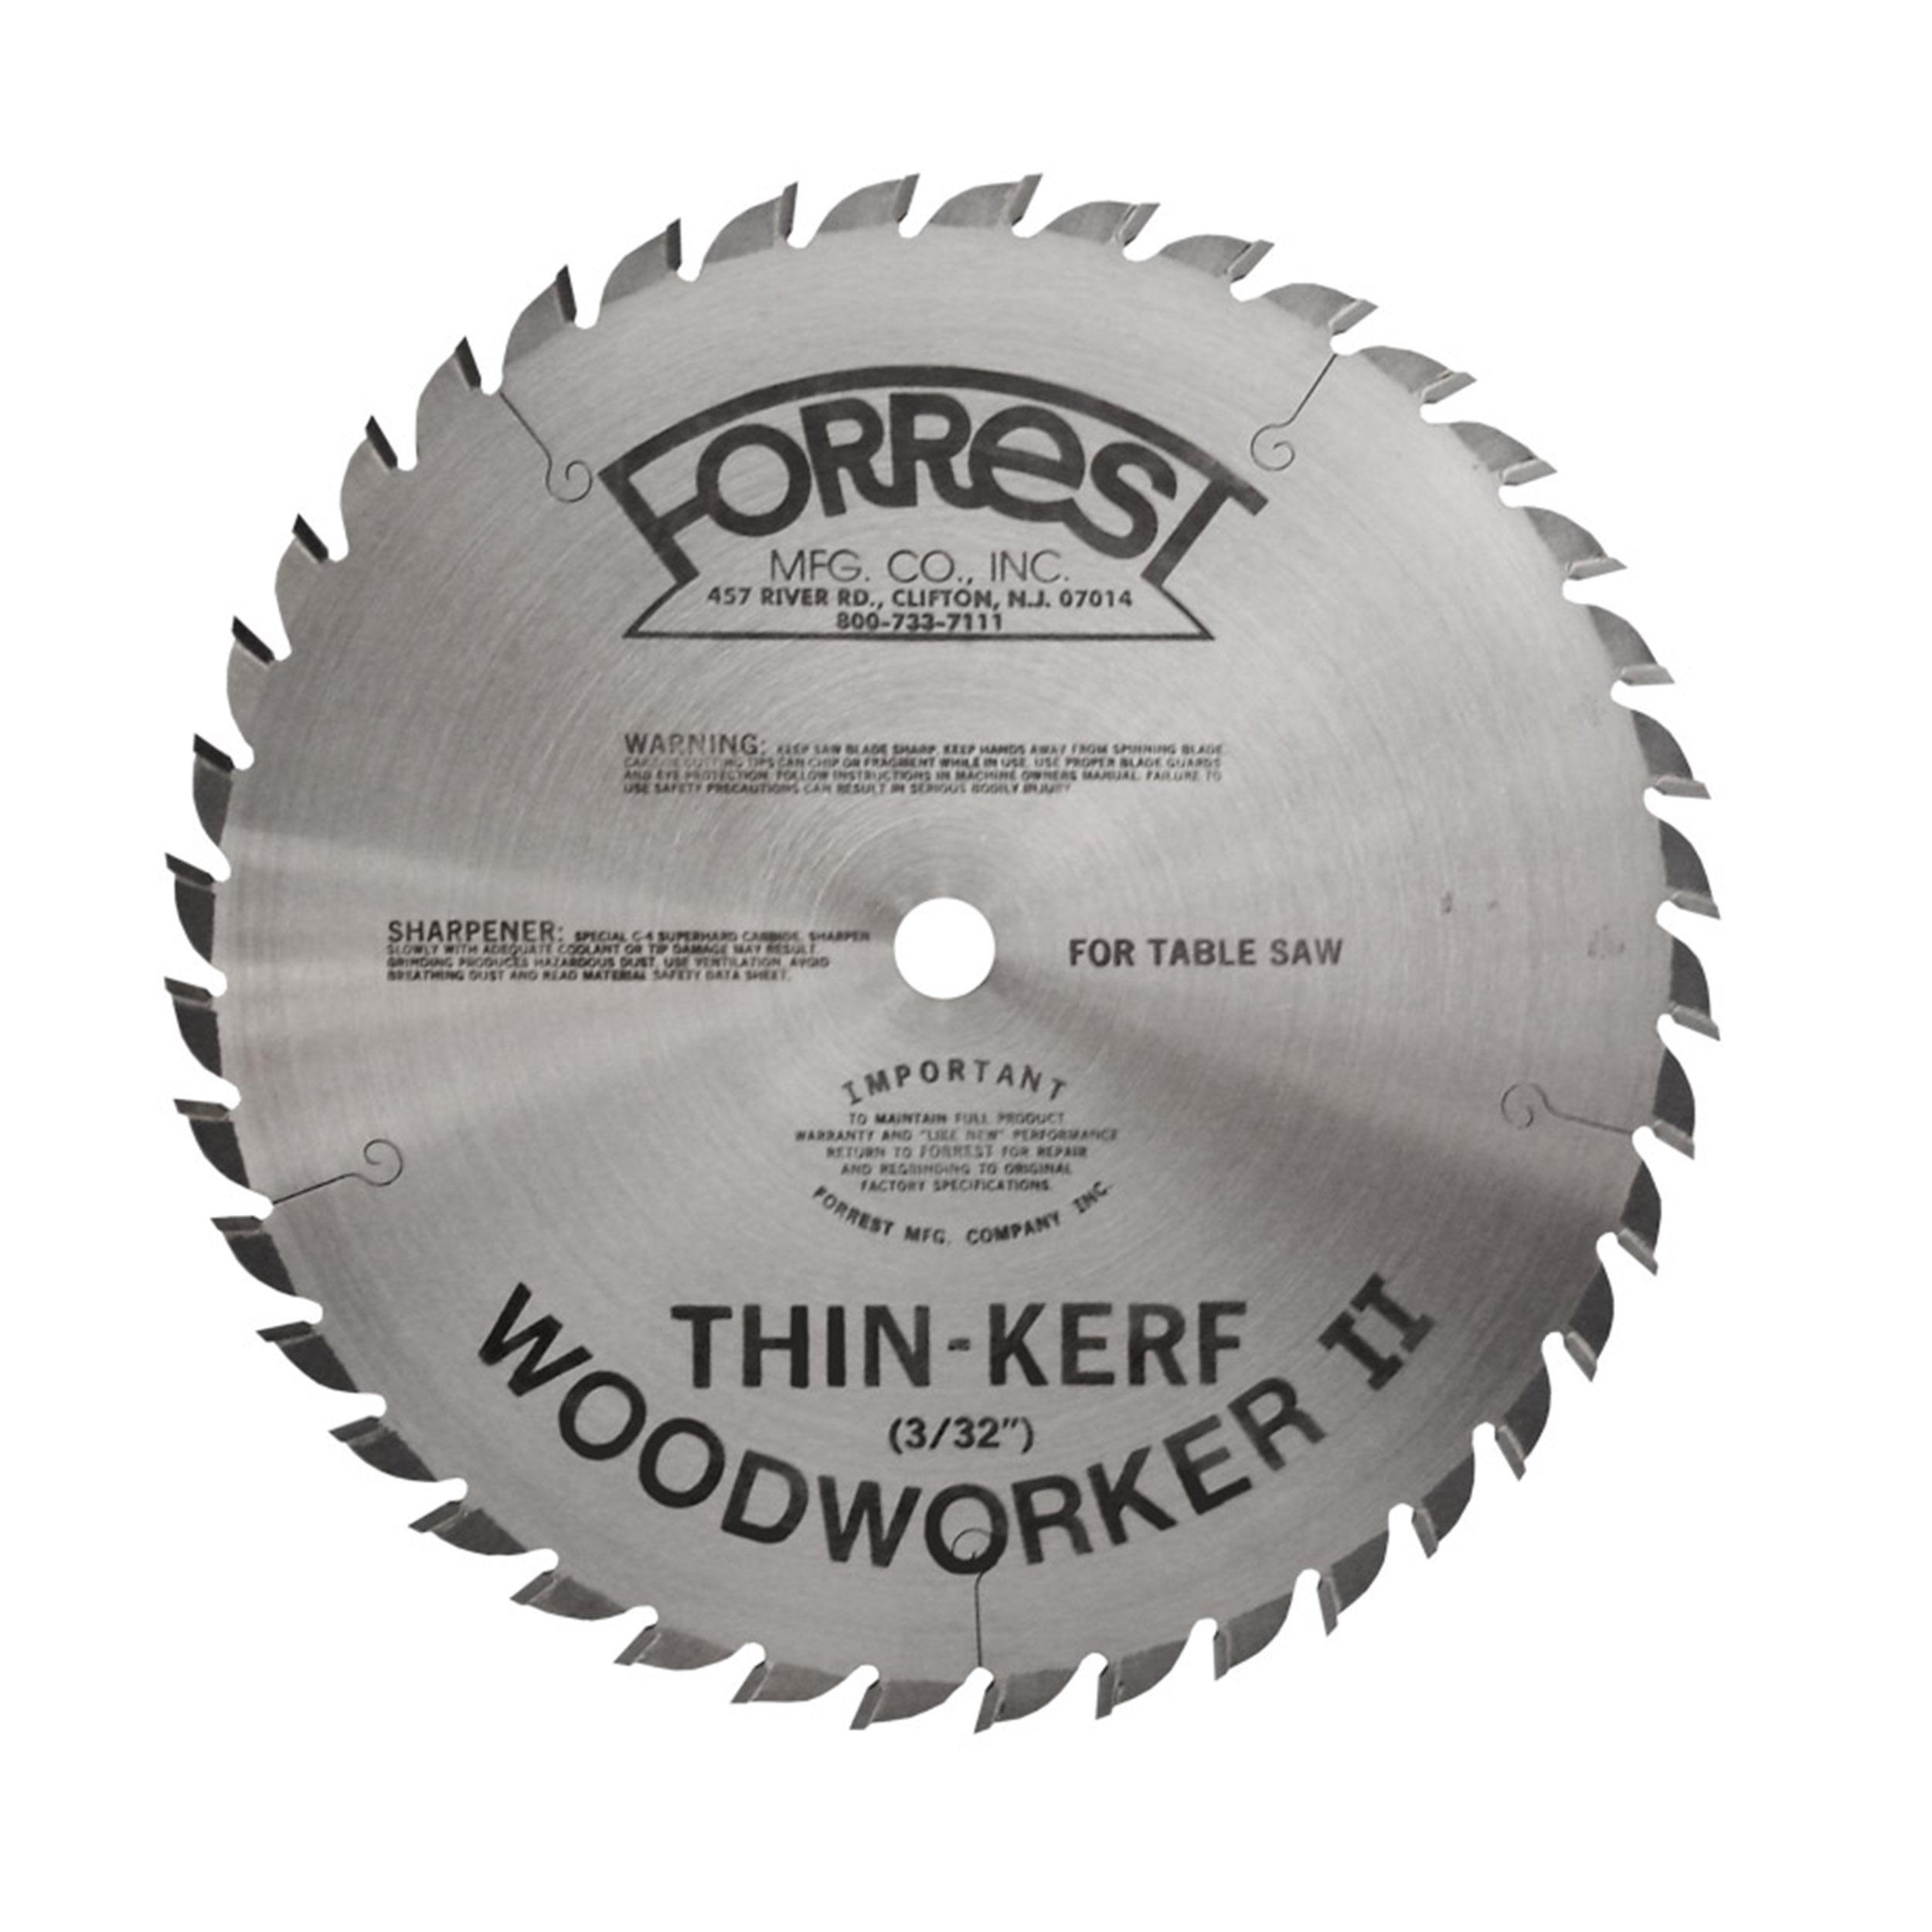 WW09407100 Woodworker II Saw Blade,  9 x 40T, .100 Kerf x 5/8 Bore, ATB